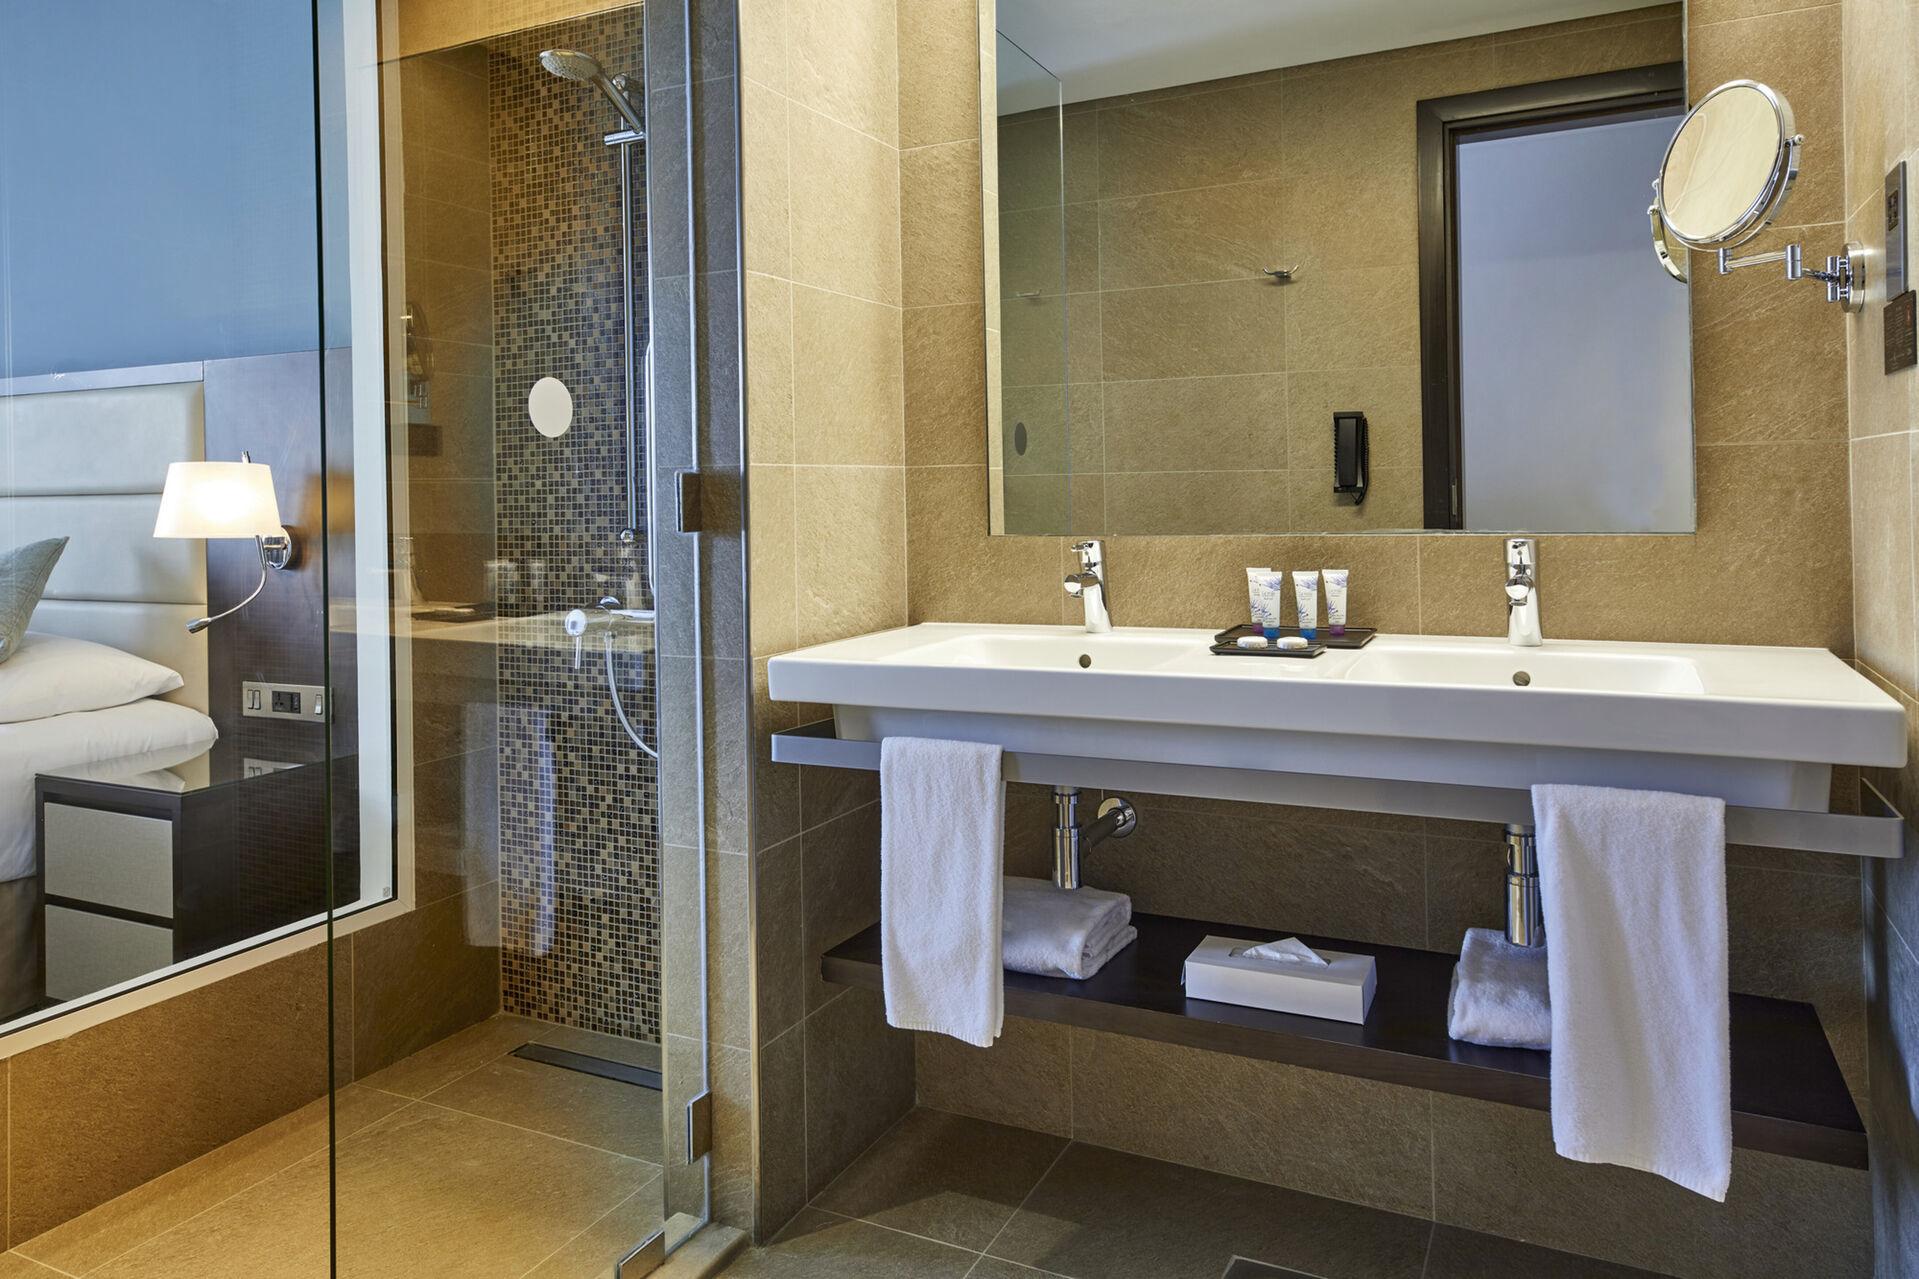 https://cms.satur.sk/data/imgs/tour_image/orig/dub_20_162-double-room-bathroom-1939897.jpg